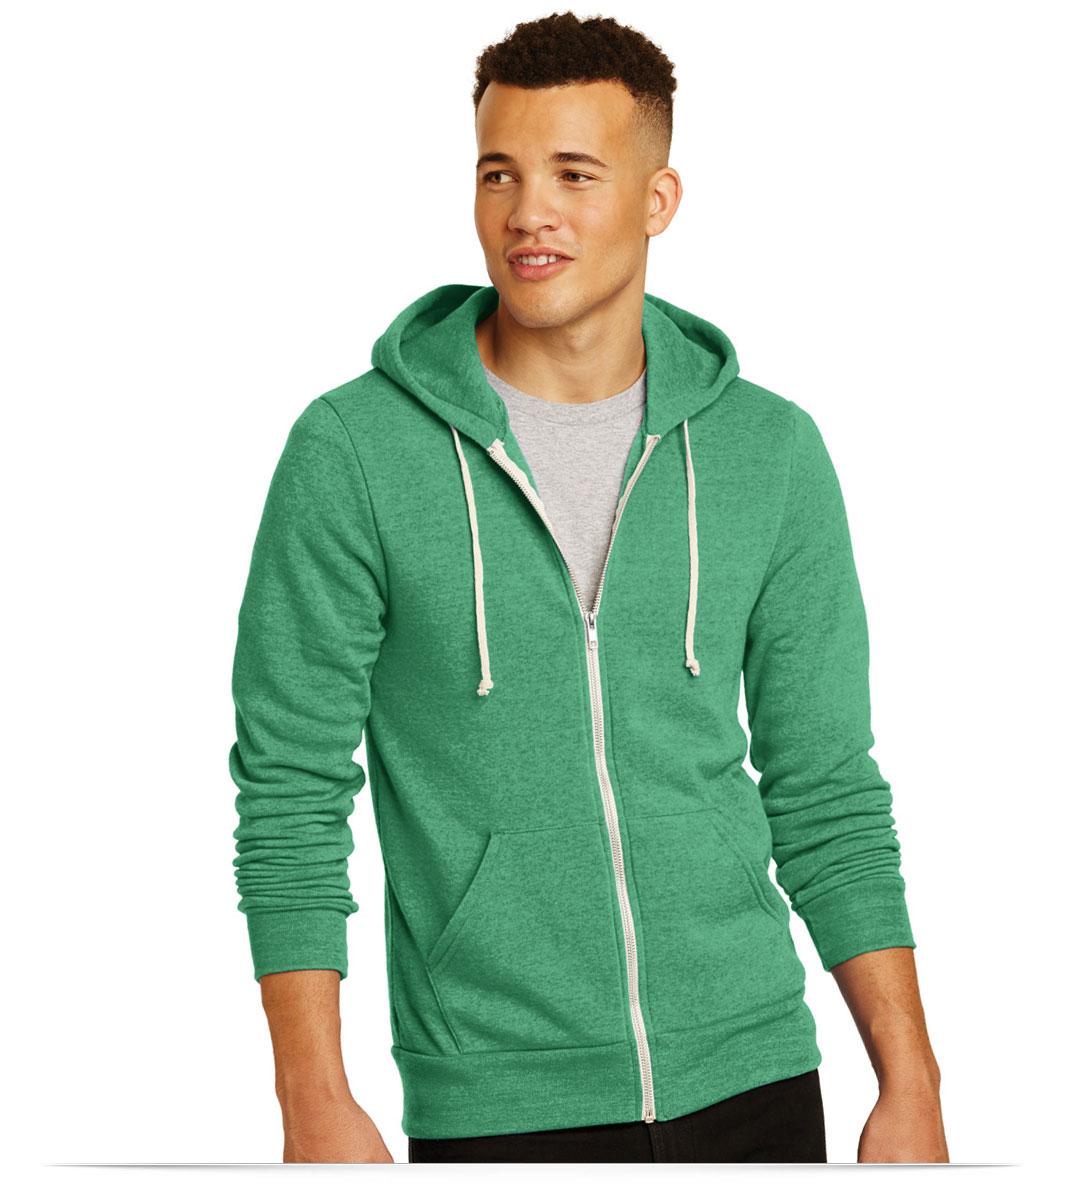 Personalized Alternative Rocky Eco-Fleece Zip Hoodie